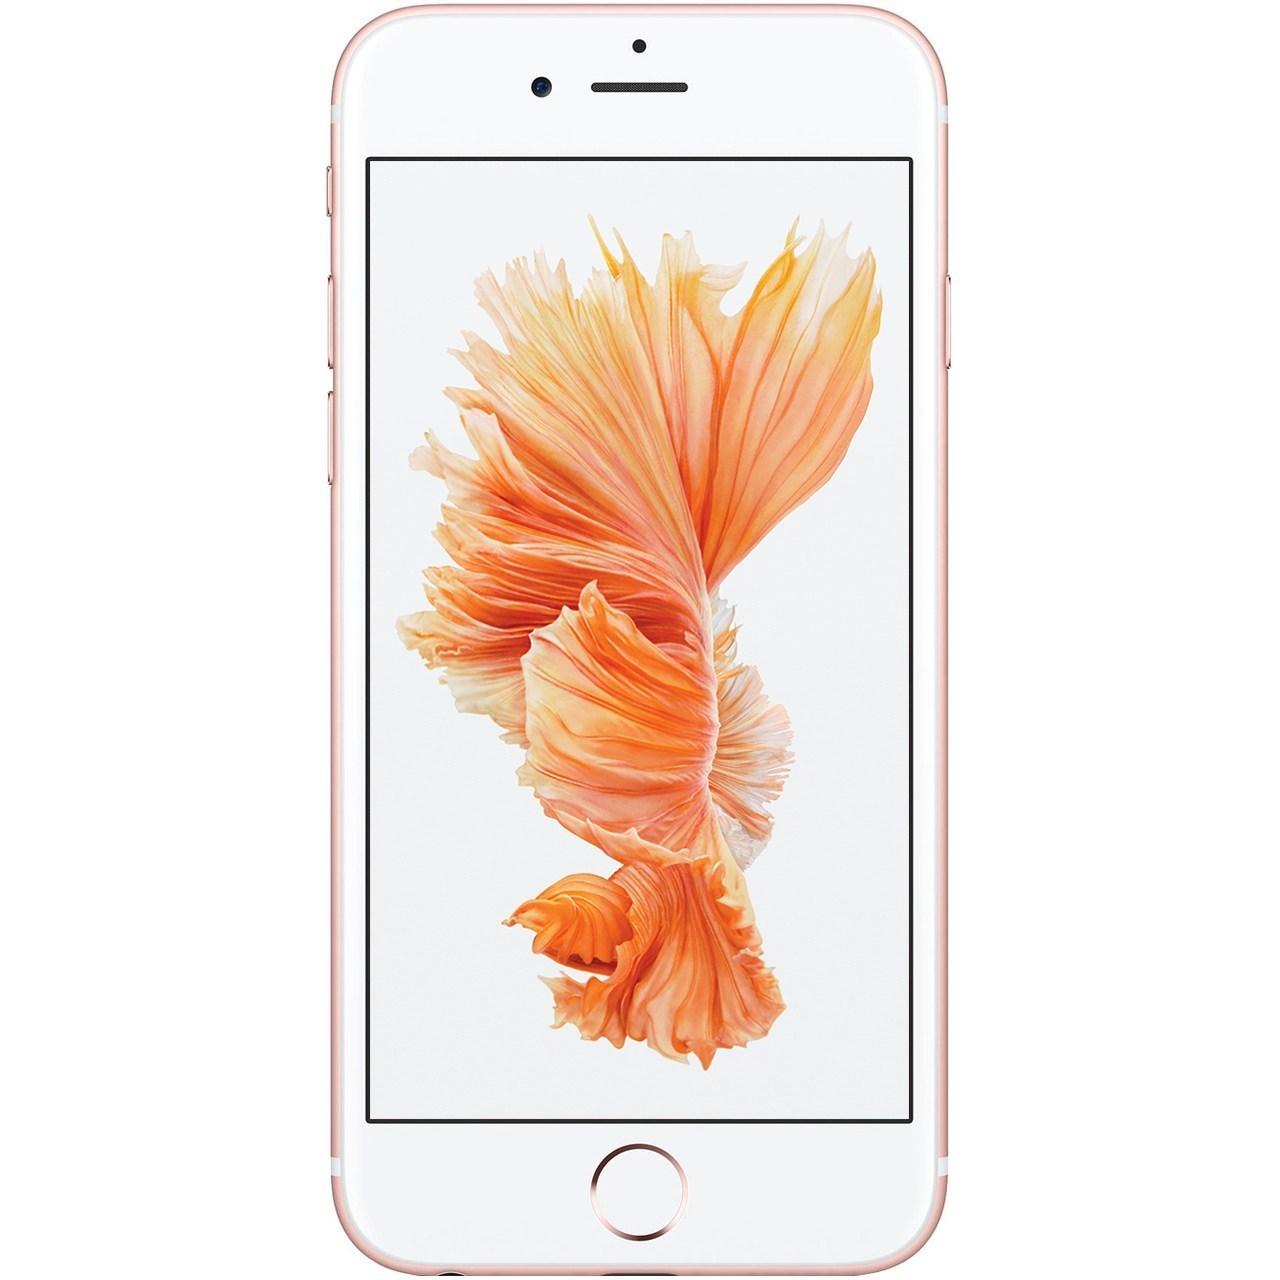 گوشی موبایل اپل مدل iPhone 6s ظرفیت 32 گیگابایت                             Apple iPhone 6s 32GB Mobile Phone